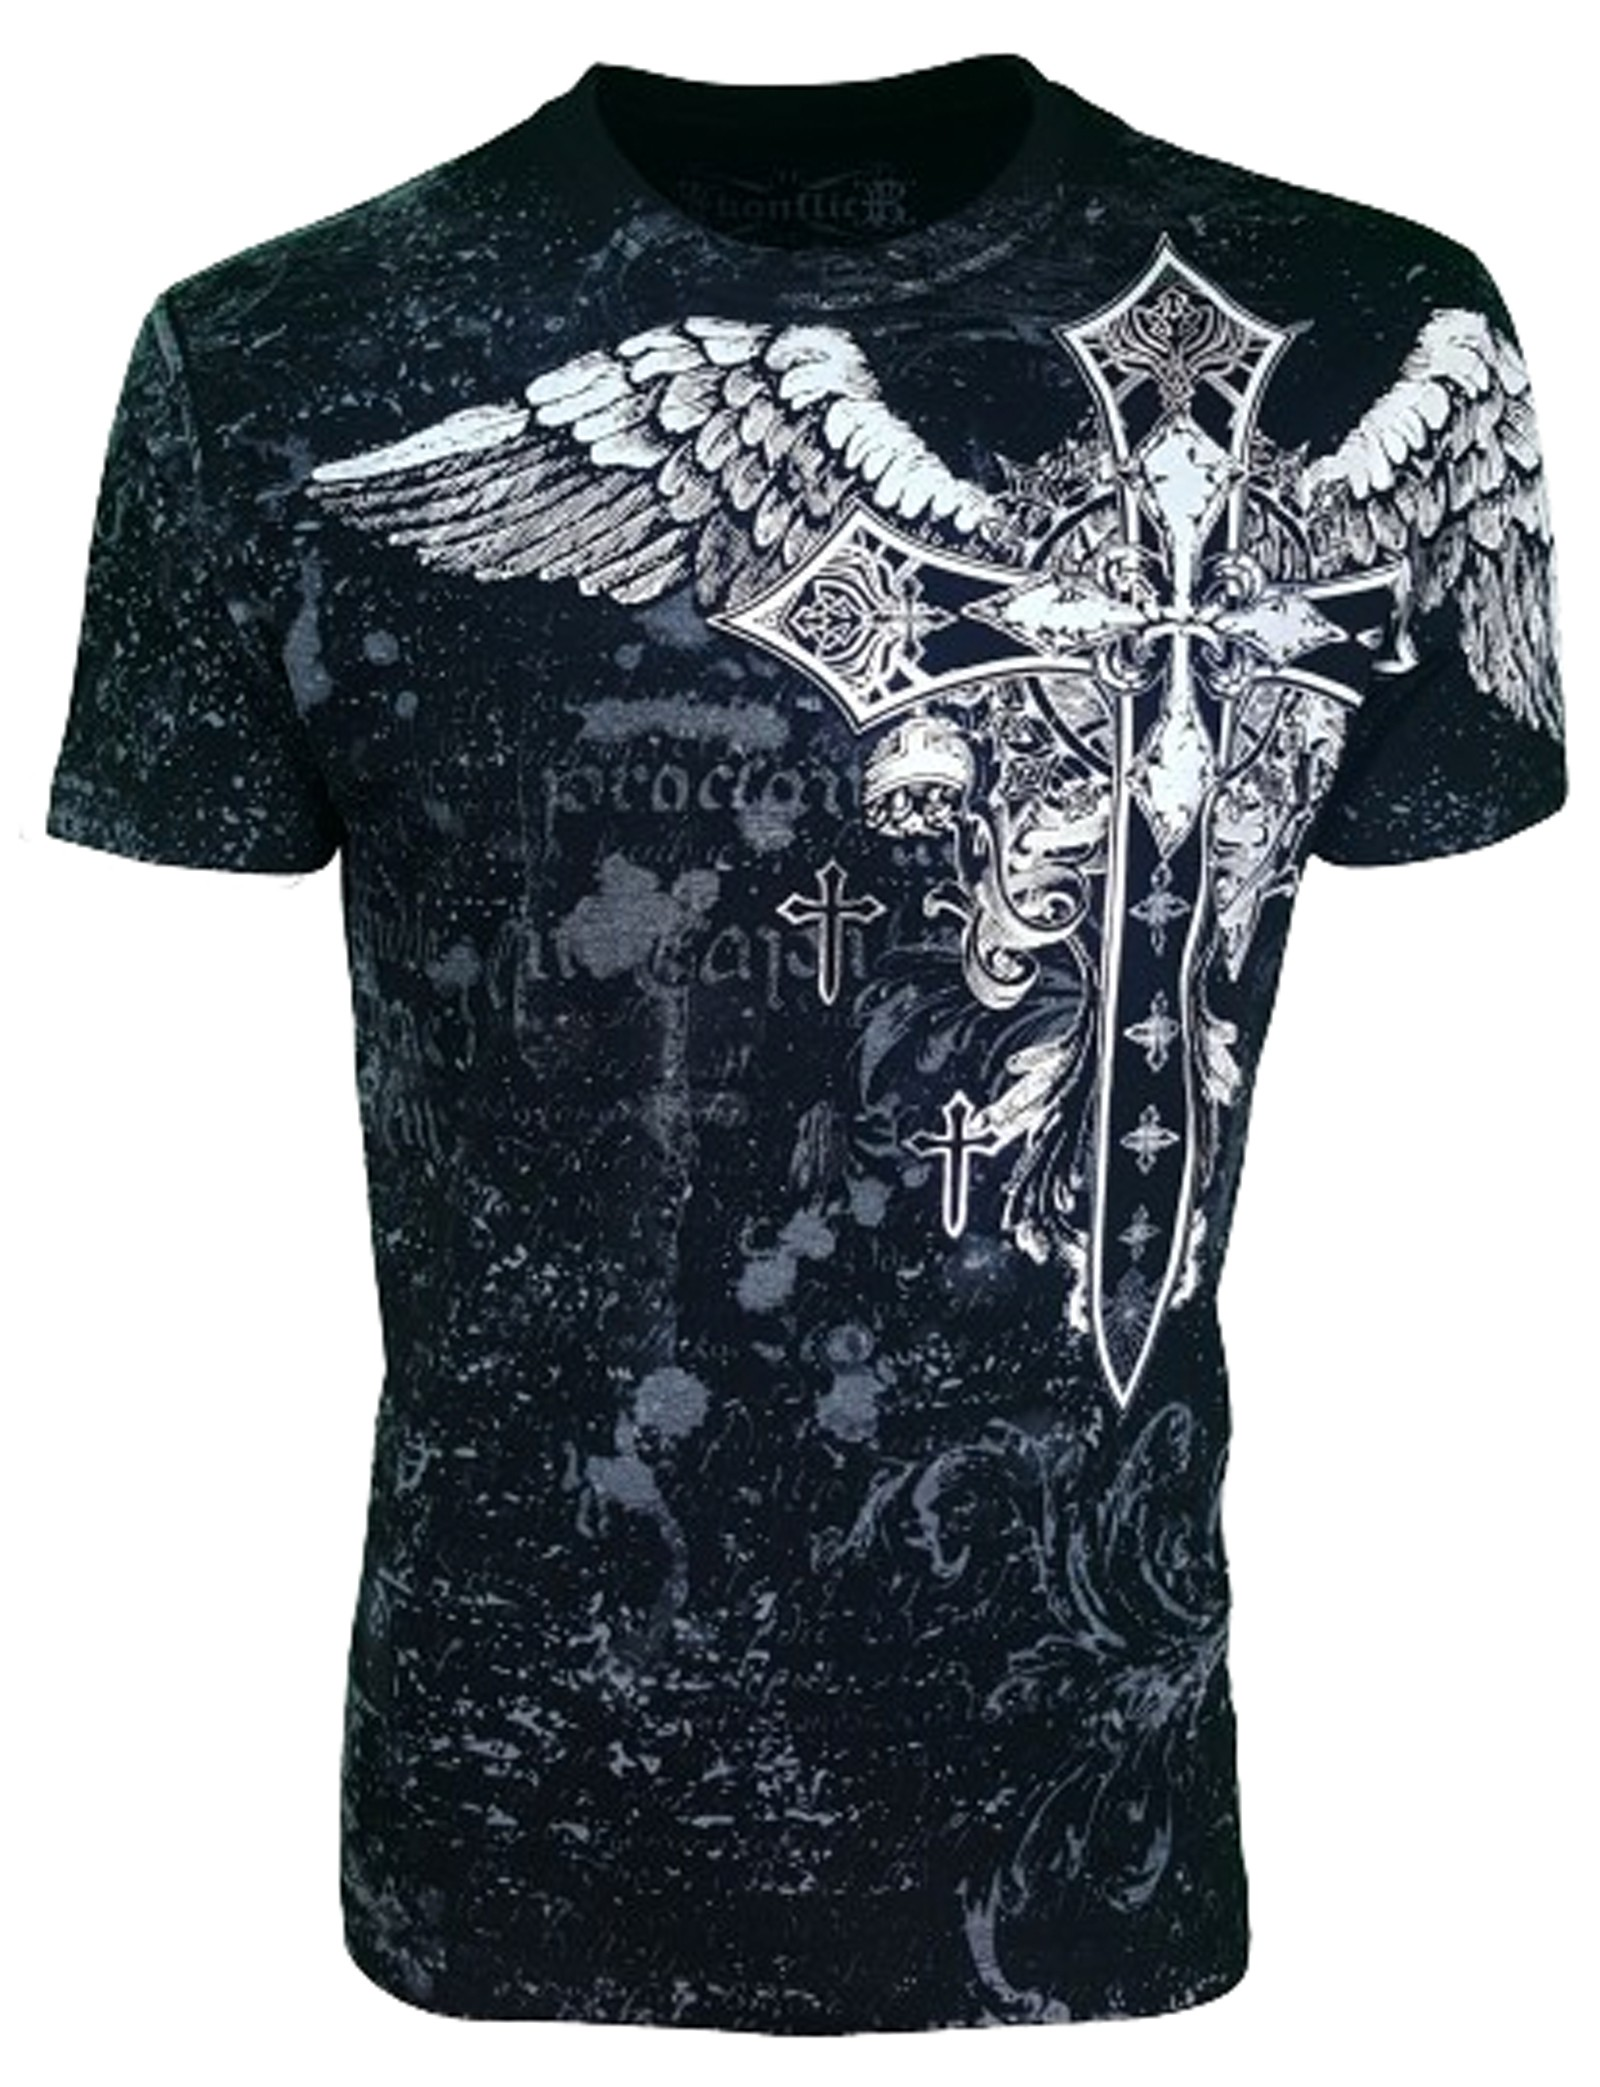 Konflic Clothing - Cross Shield T-Shirt